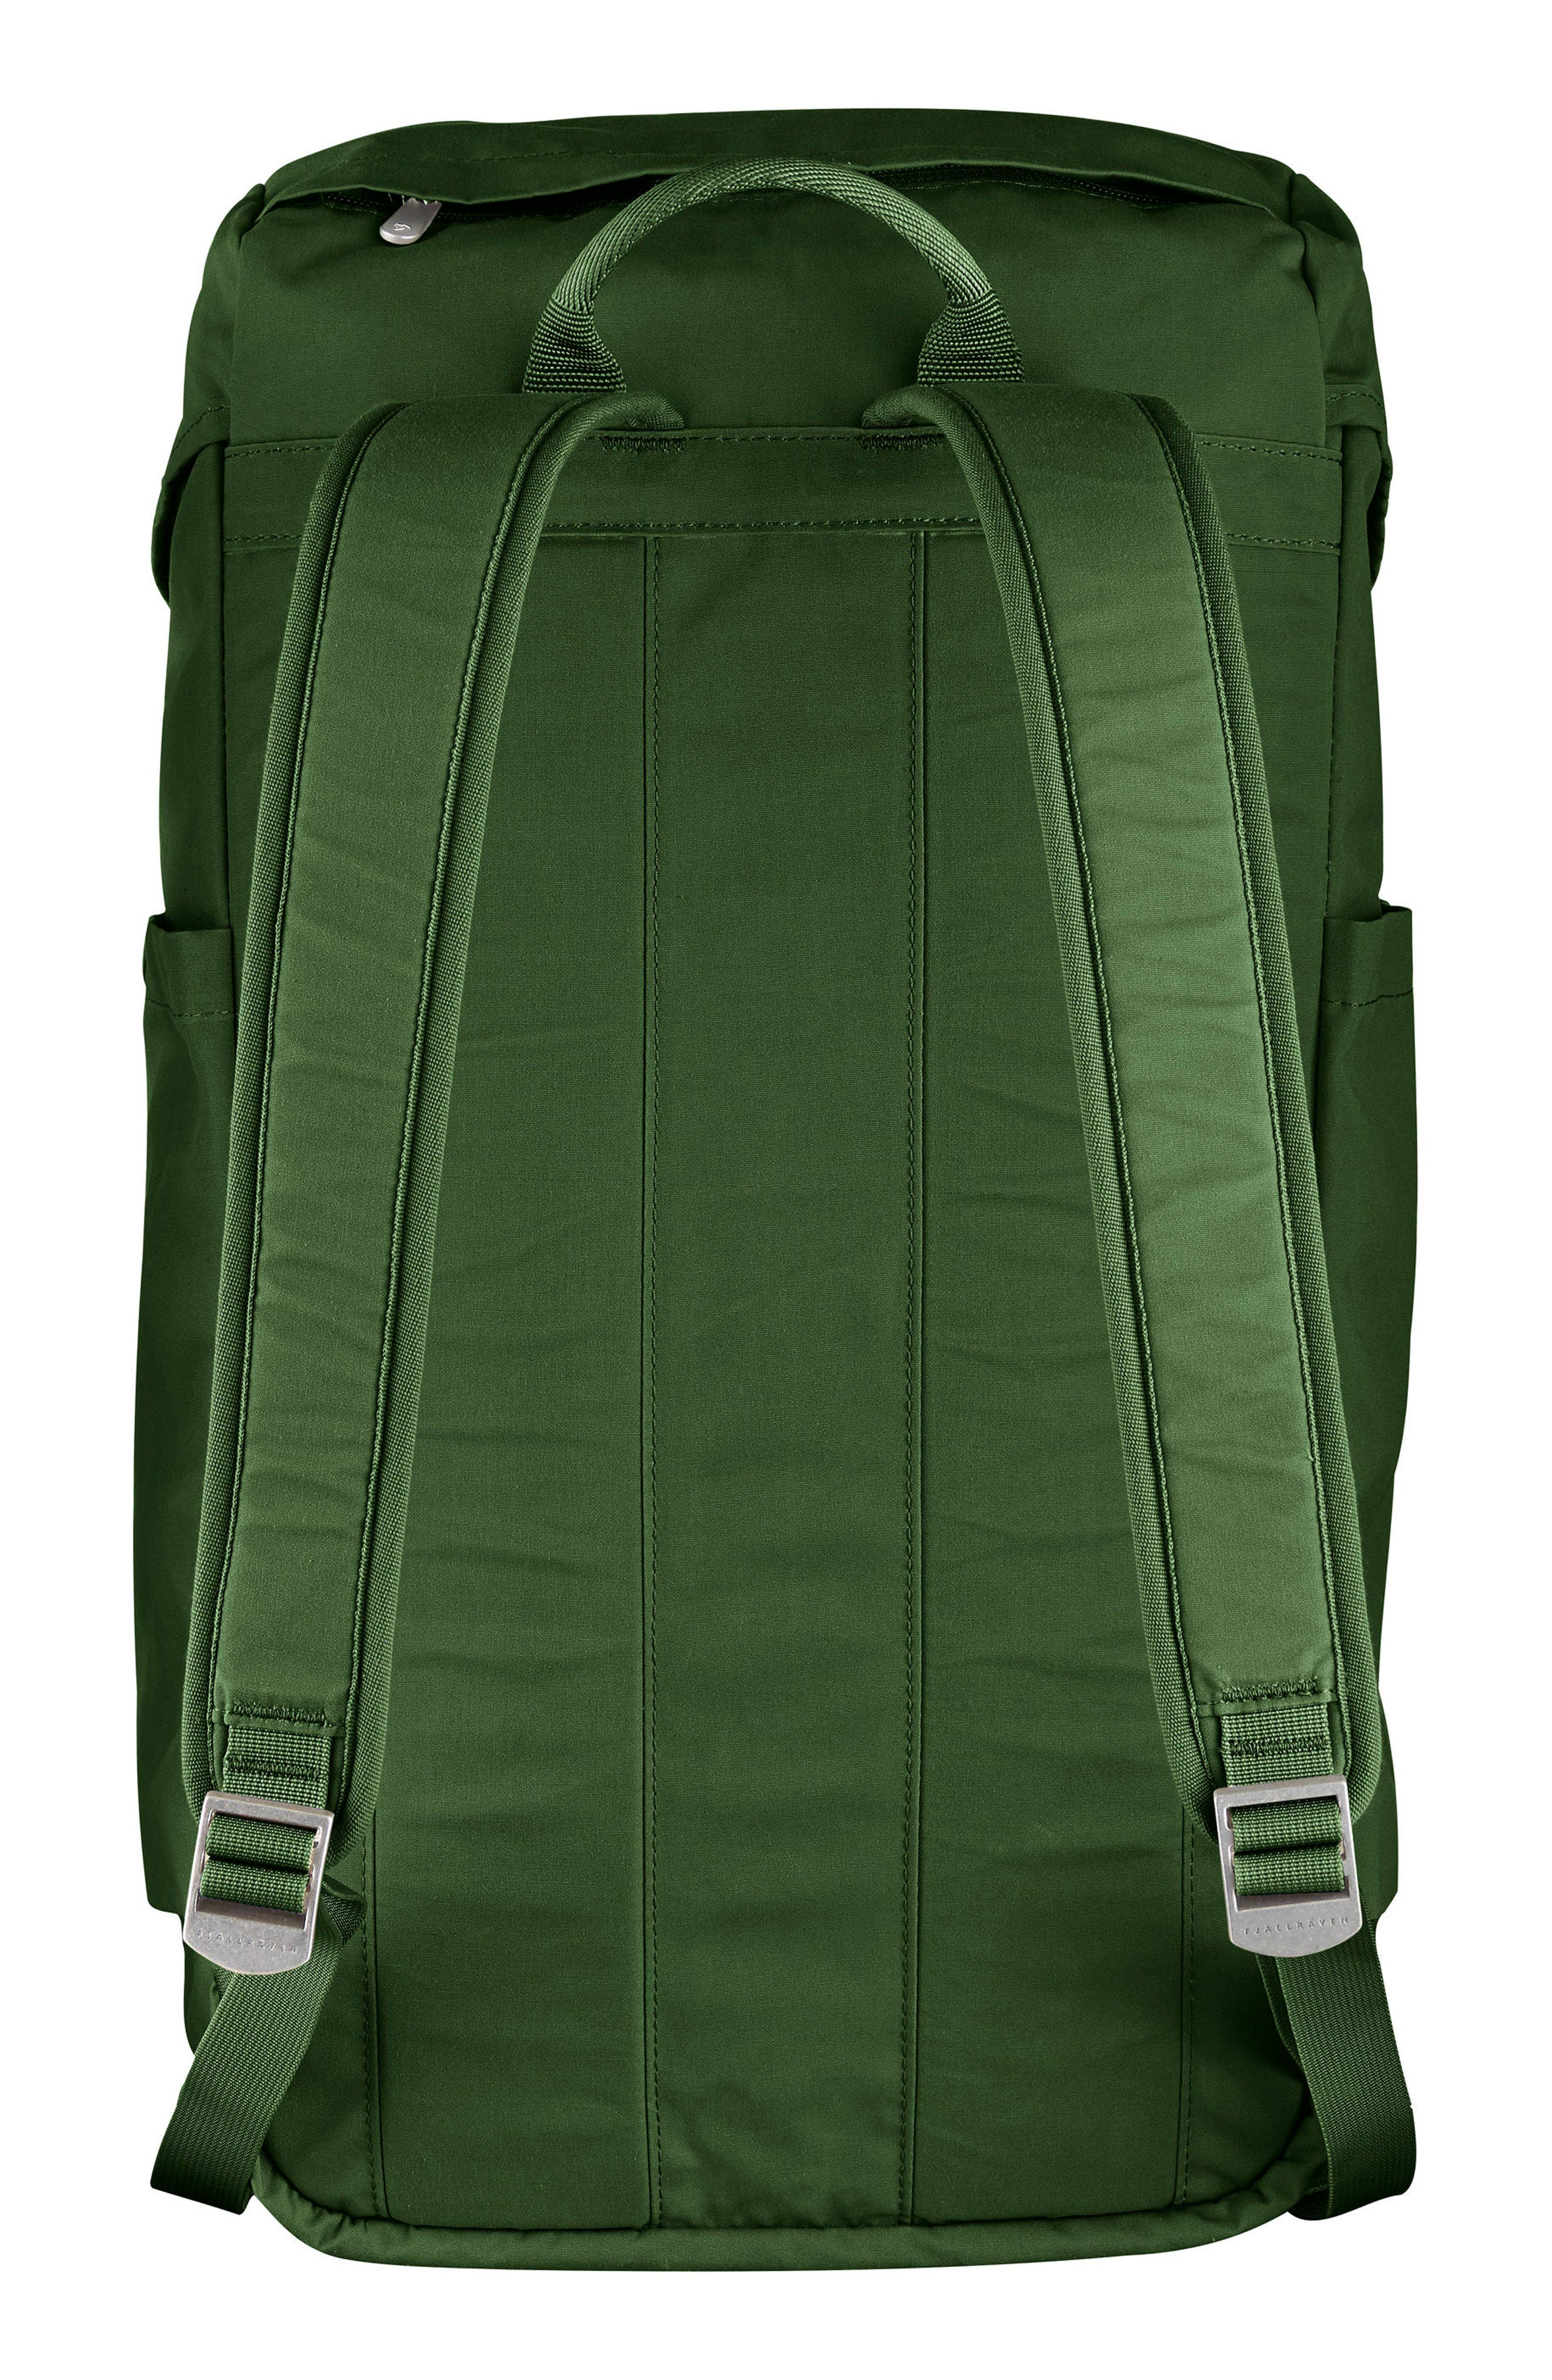 Greenland Large Backpack,                             Alternate thumbnail 2, color,                             FERN